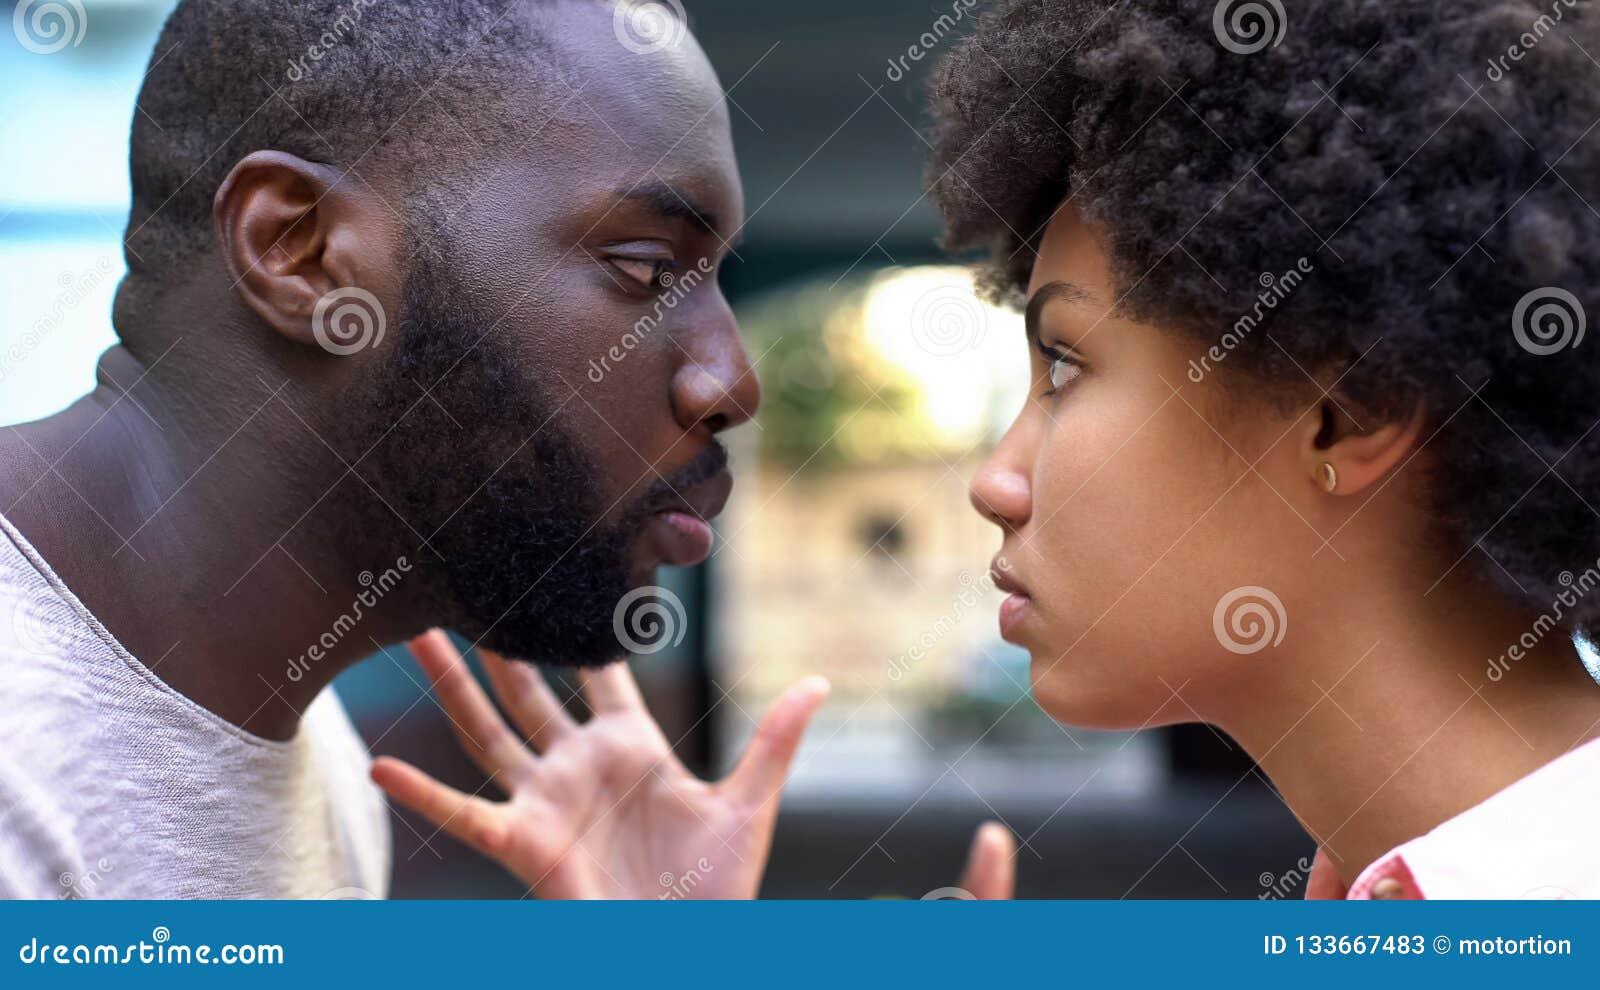 How to kiss a girl you really like